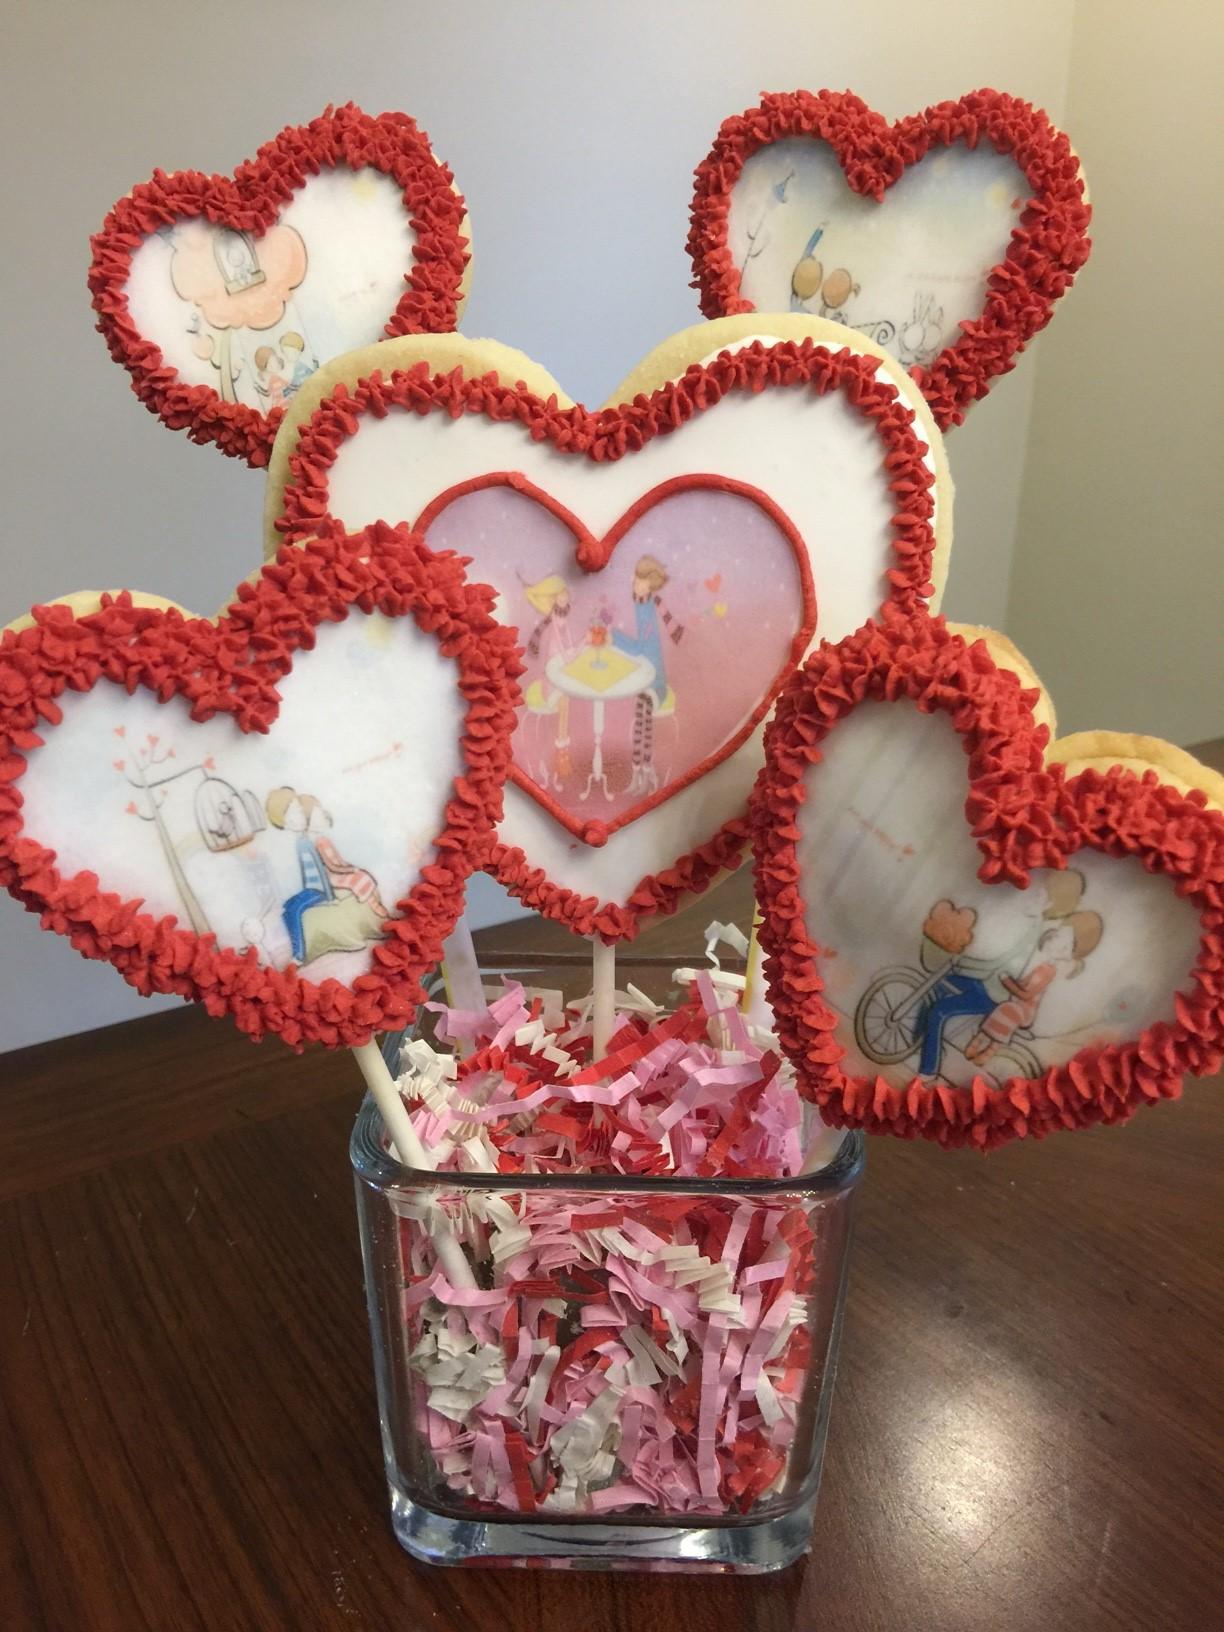 #Valentine #Personalized #SugarCookie #Cookie